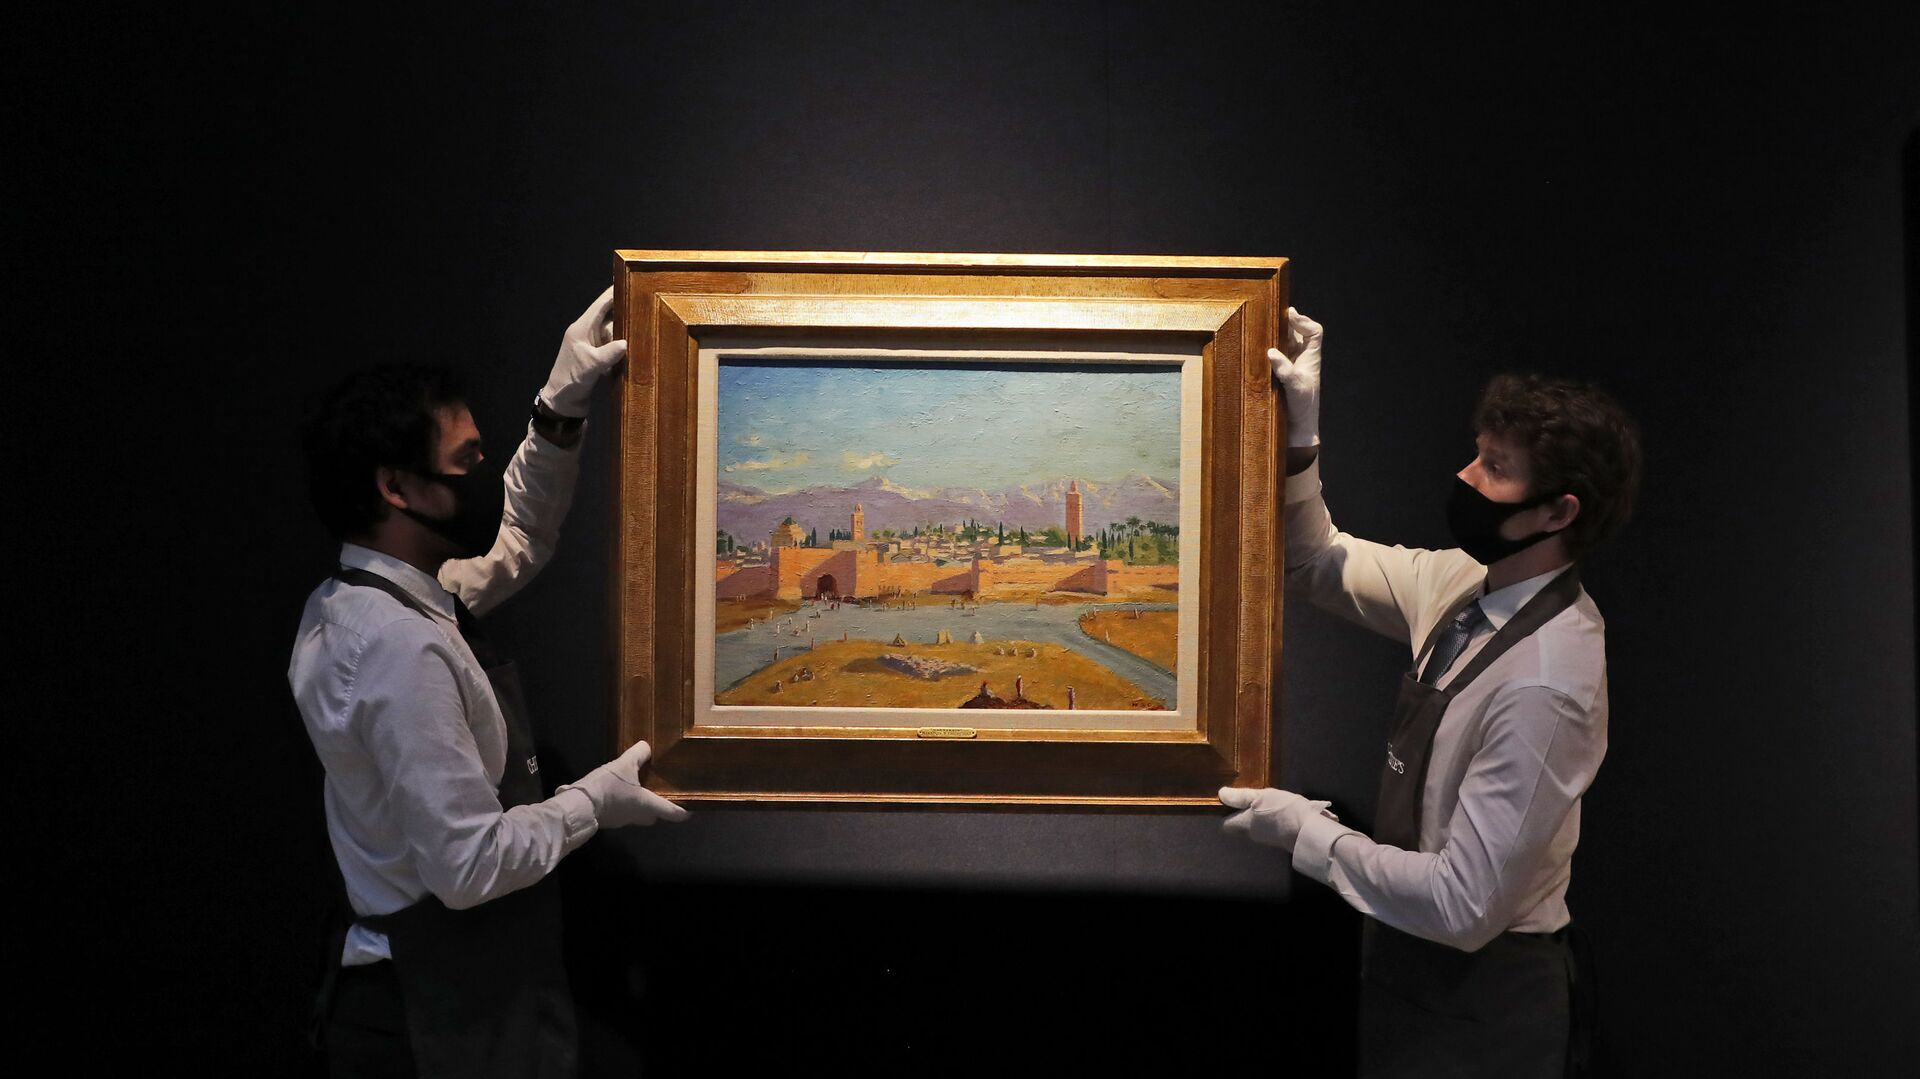 "Obraz Winstona Churchilla ""Minaret meczetu Al-Koutoubiya"" na aukcji Christie's - Sputnik Polska, 1920, 02.03.2021"